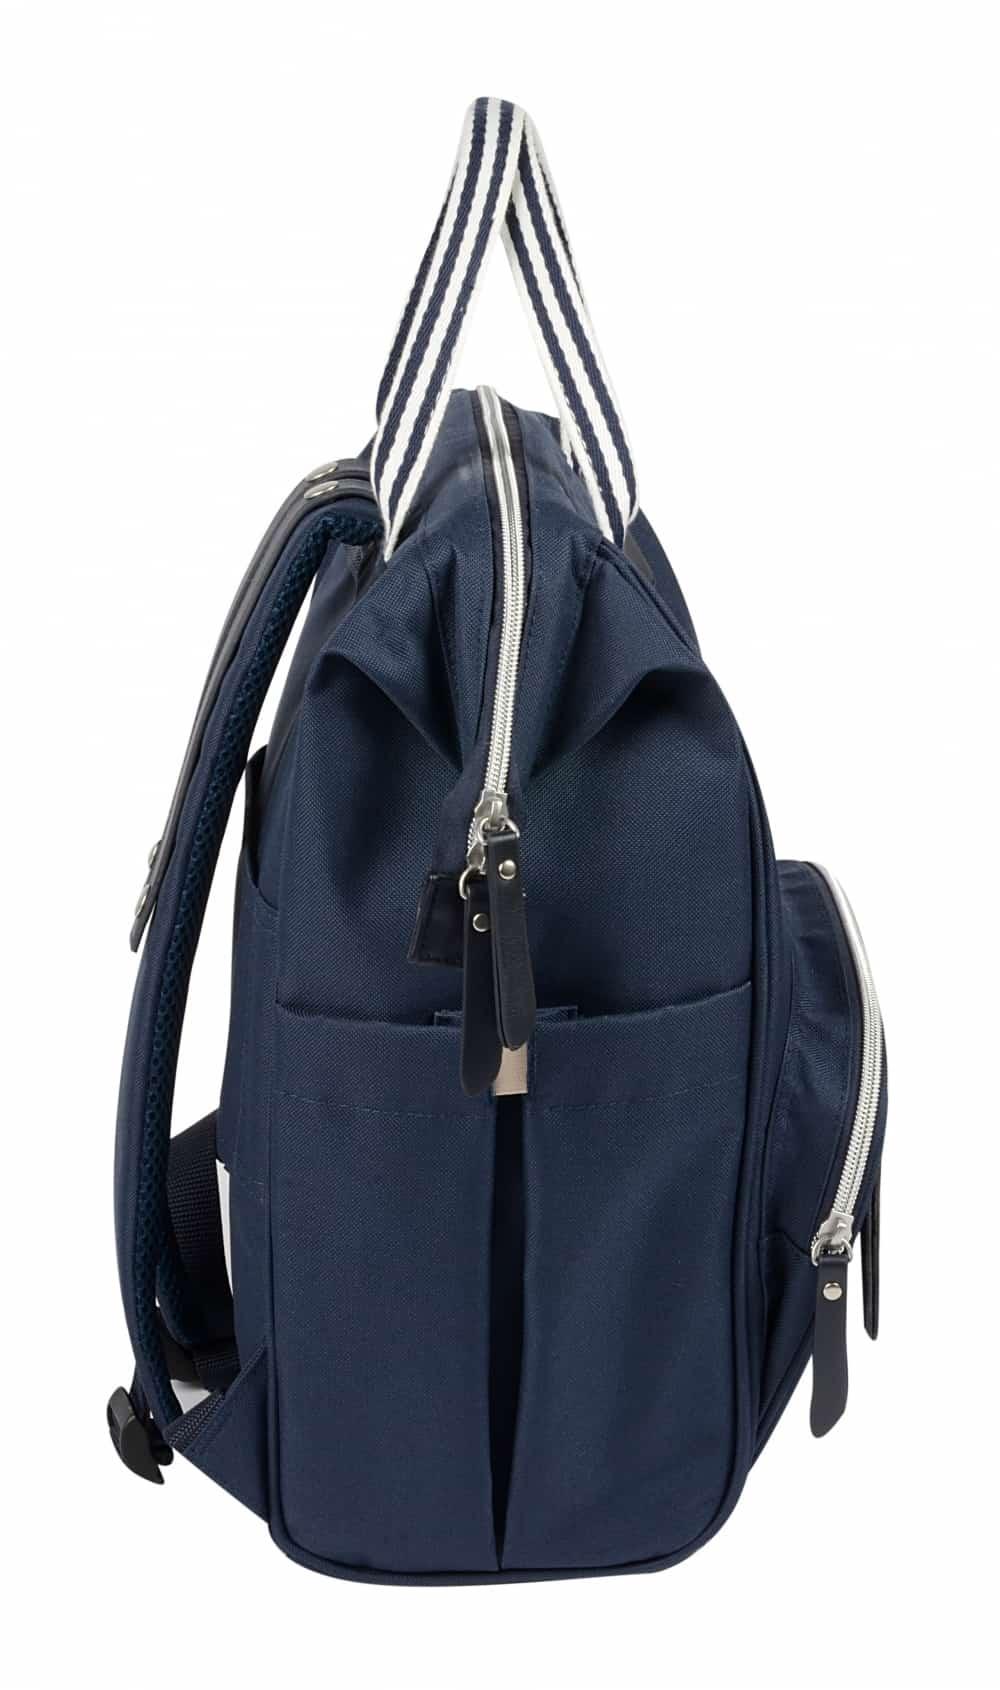 Wellington Backpack Diaper Bag Navy